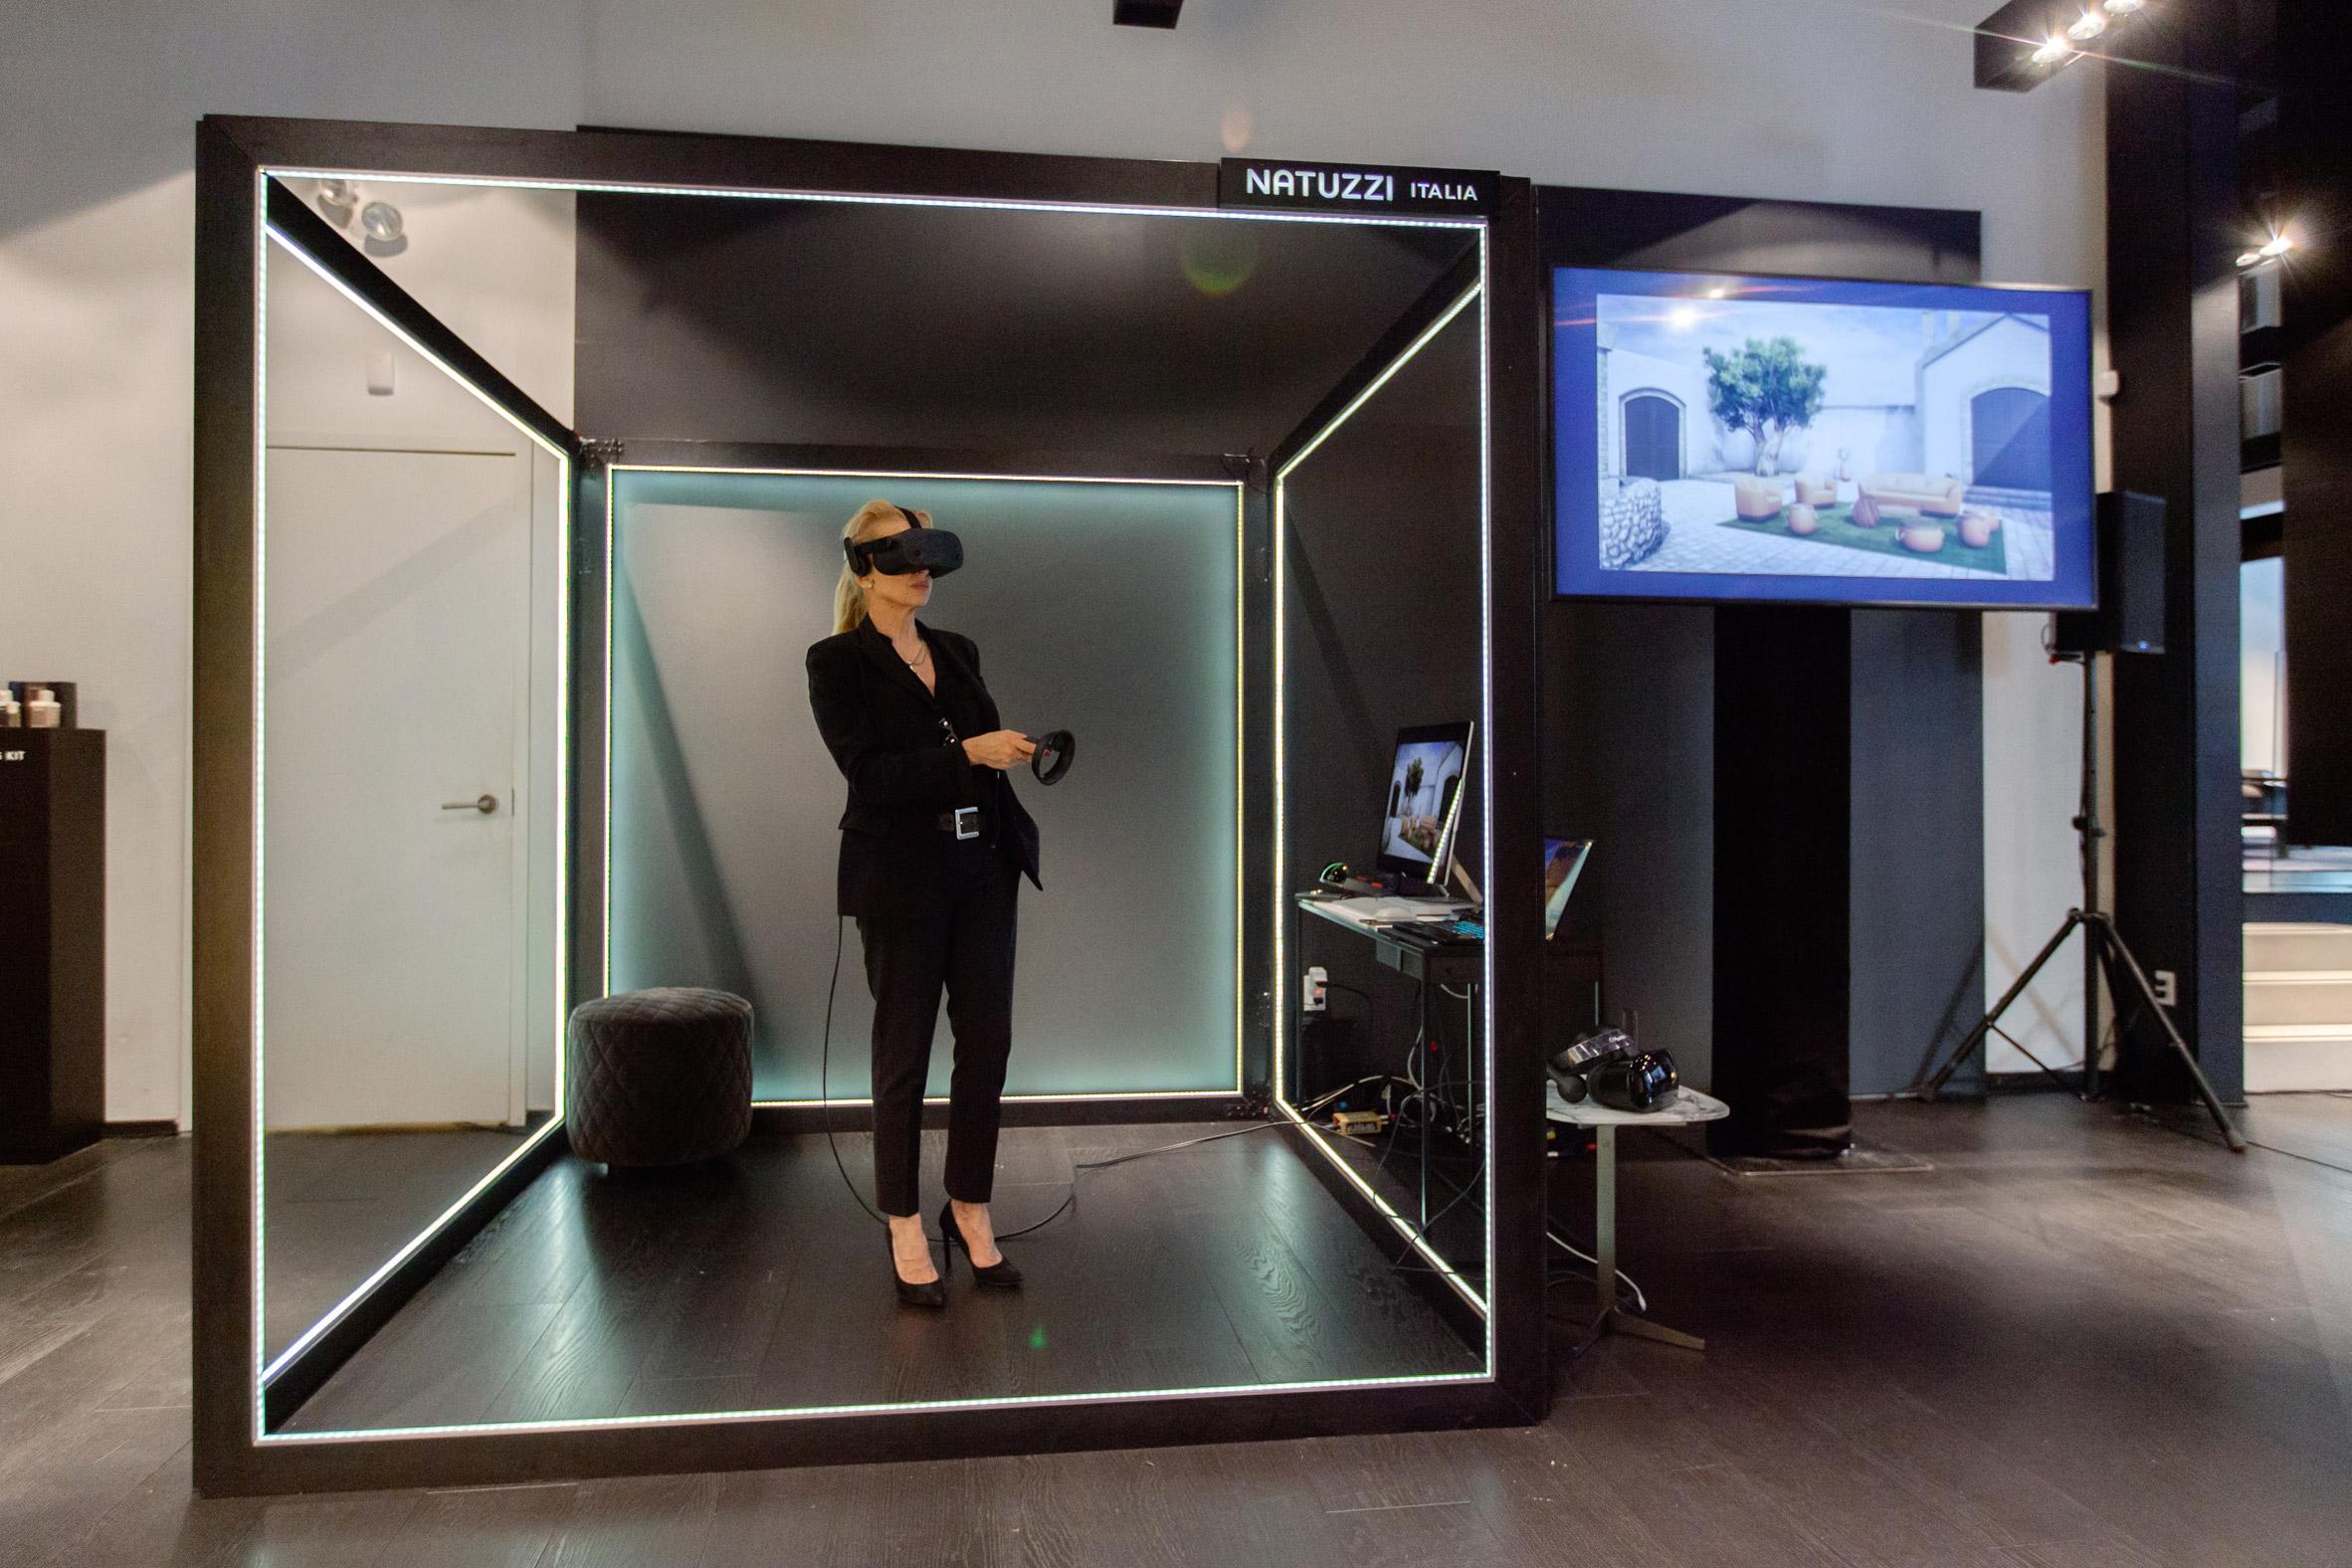 Design Bank Natuzzi.Natuzzi Launches Augmented Store For Vr Furniture Shopping